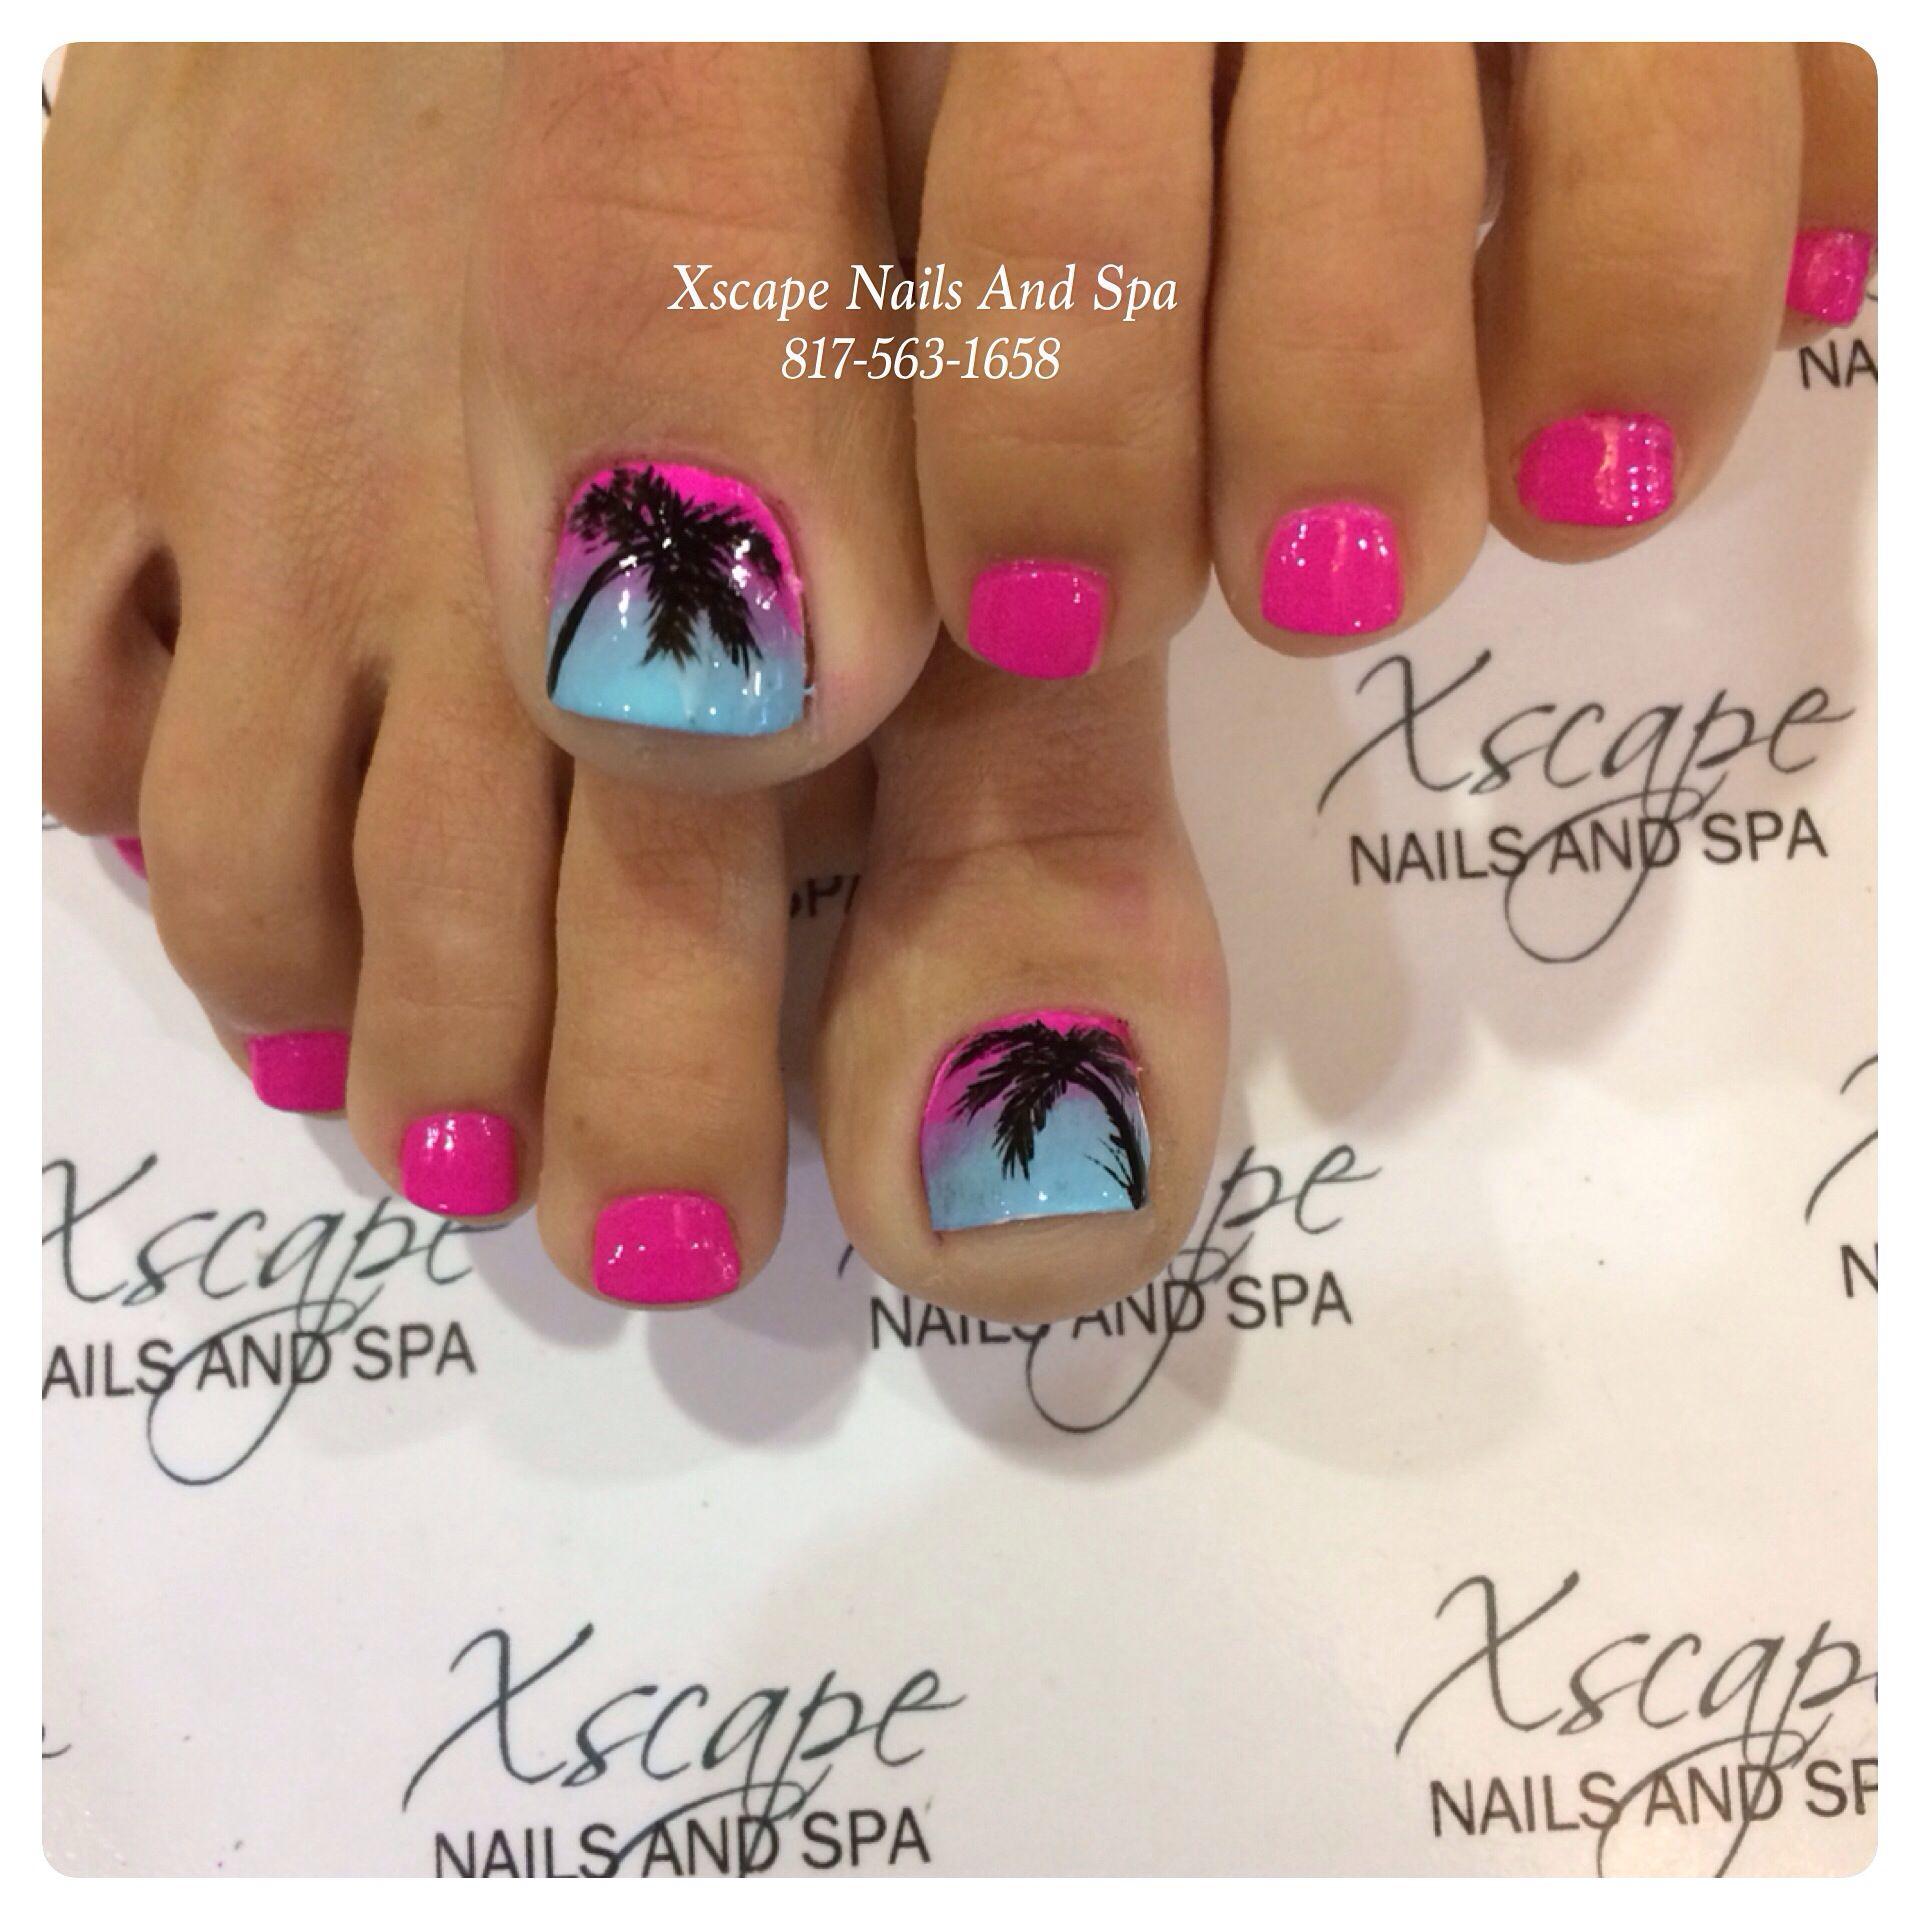 Hot pink - Lavender - Sky blue - Black - Ombre - Palm trees ...